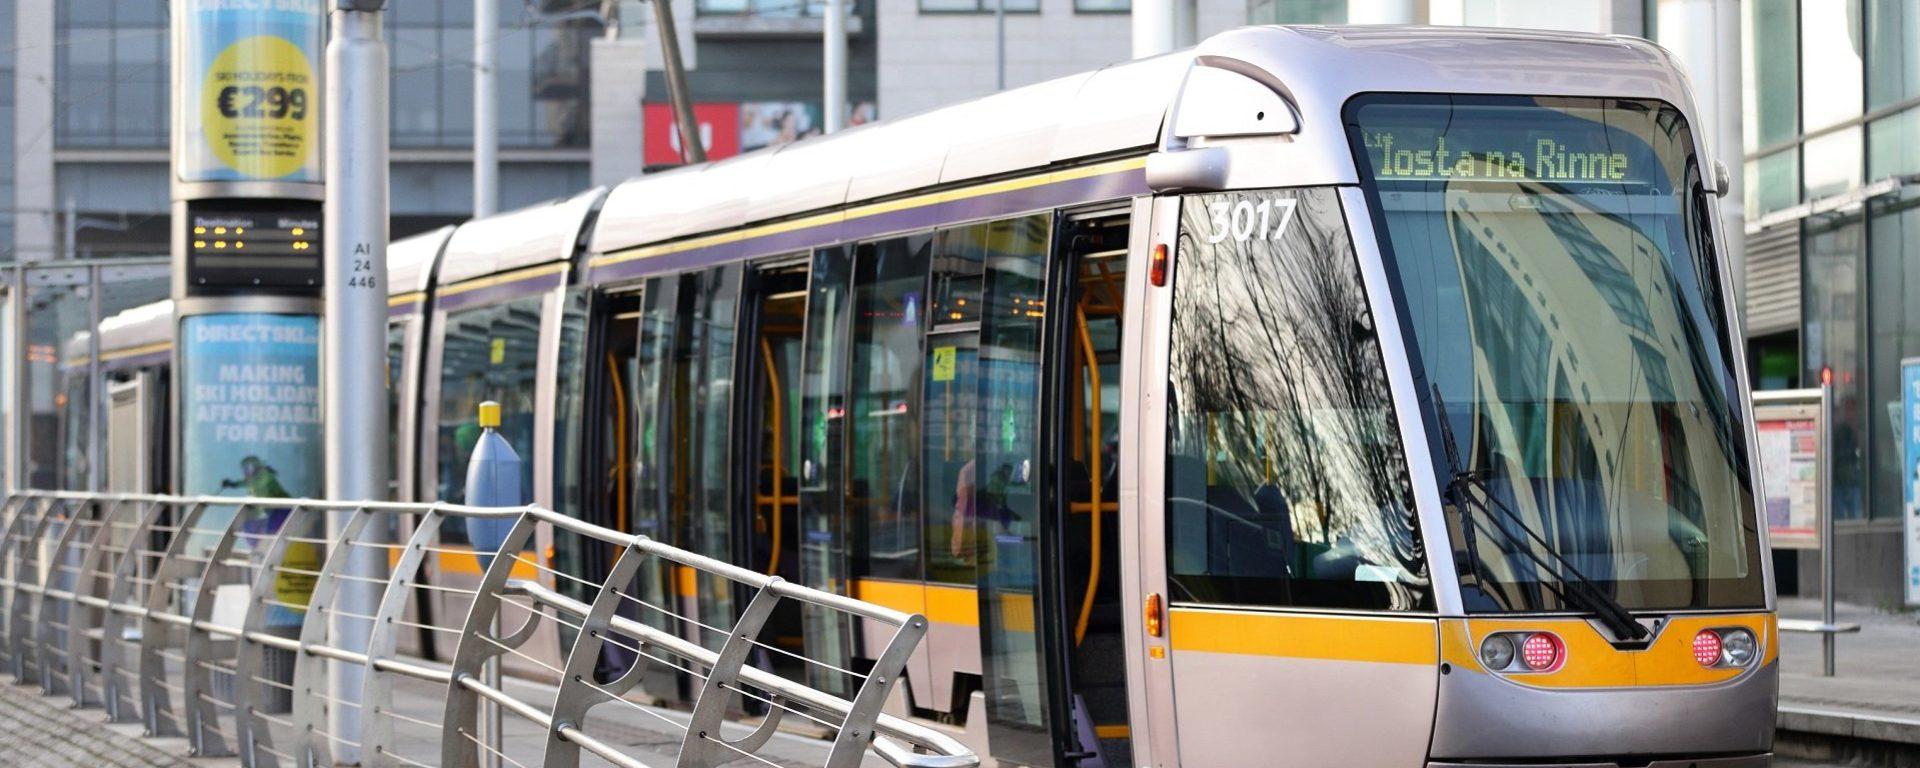 Transdev awarded Dublin's Light Rail six-year operation and